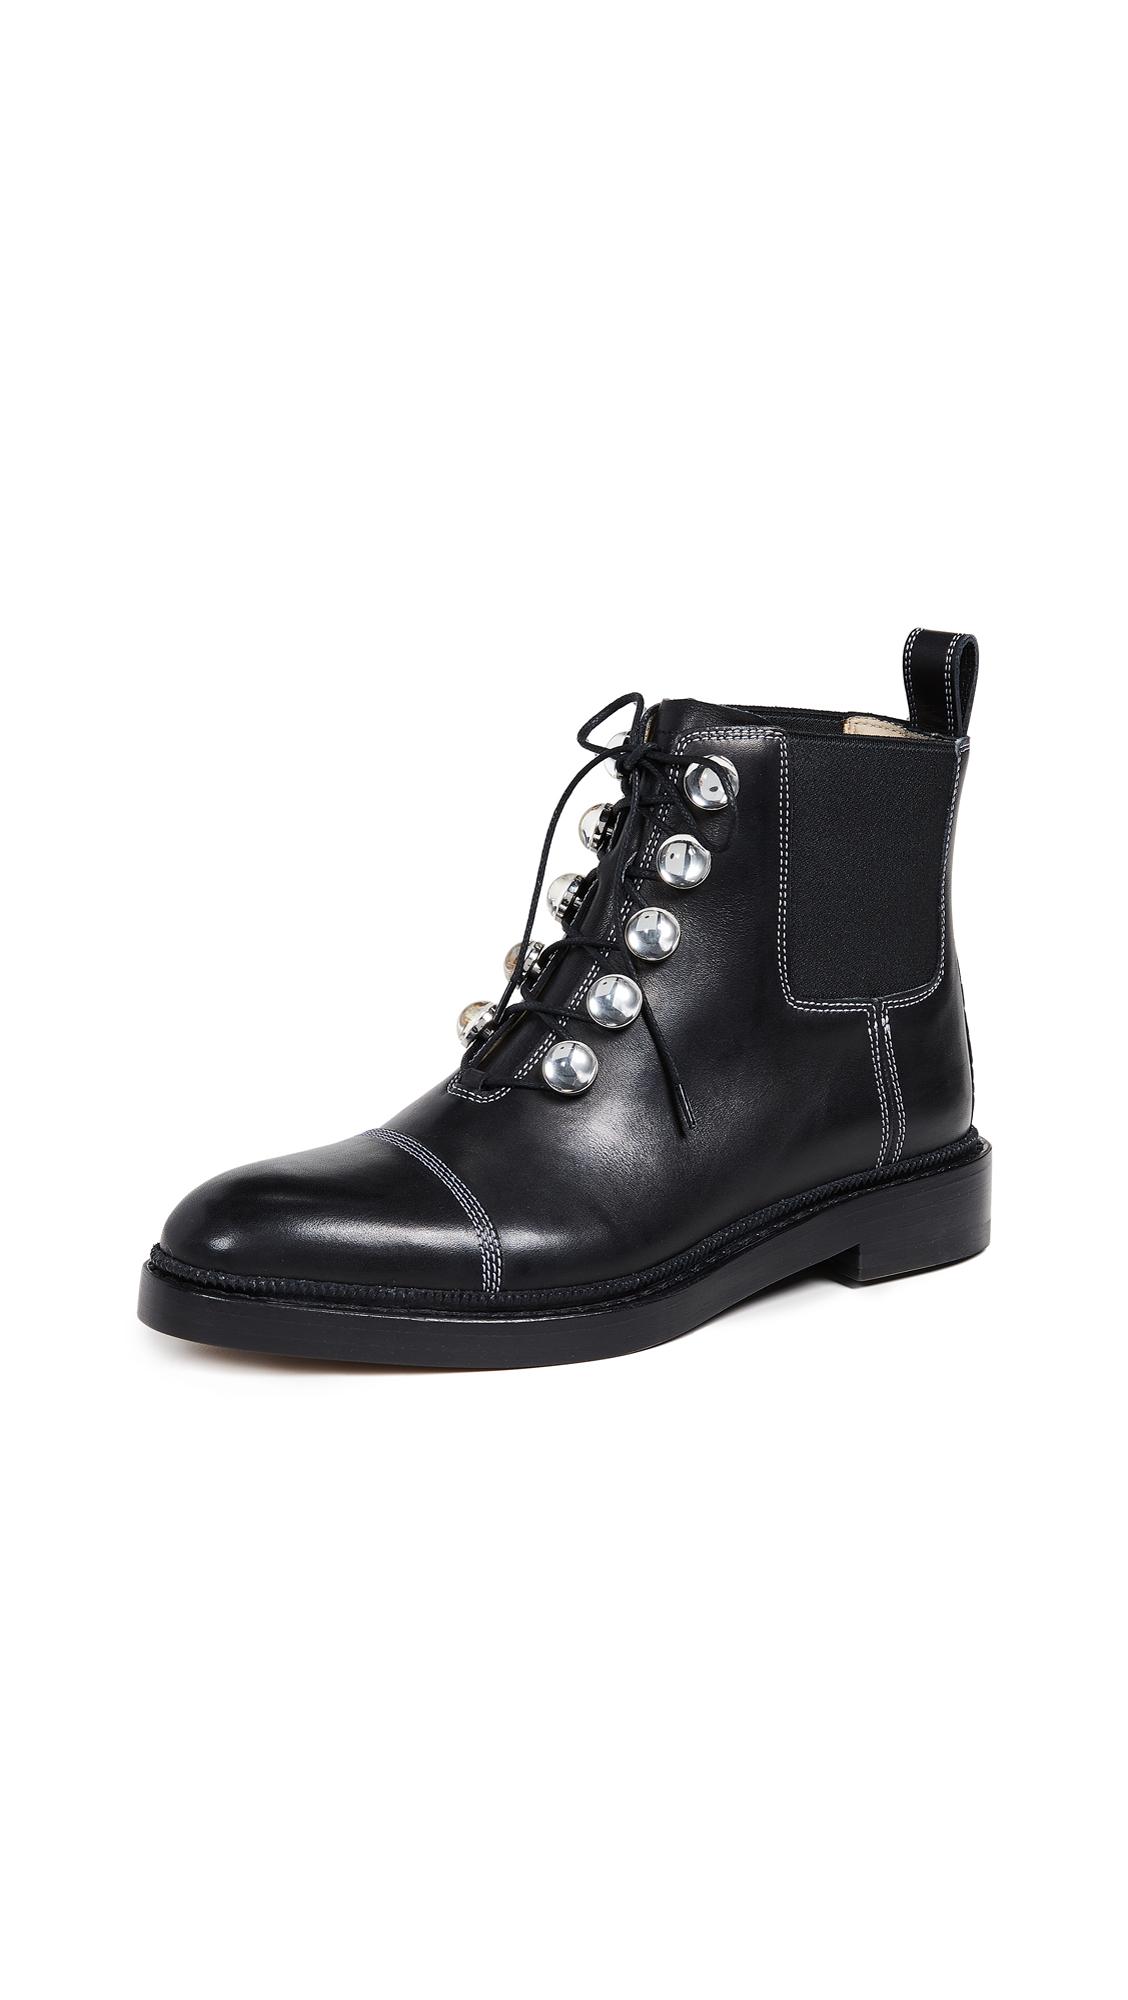 Paul Andrew Brescia Stones Boots - Black/White